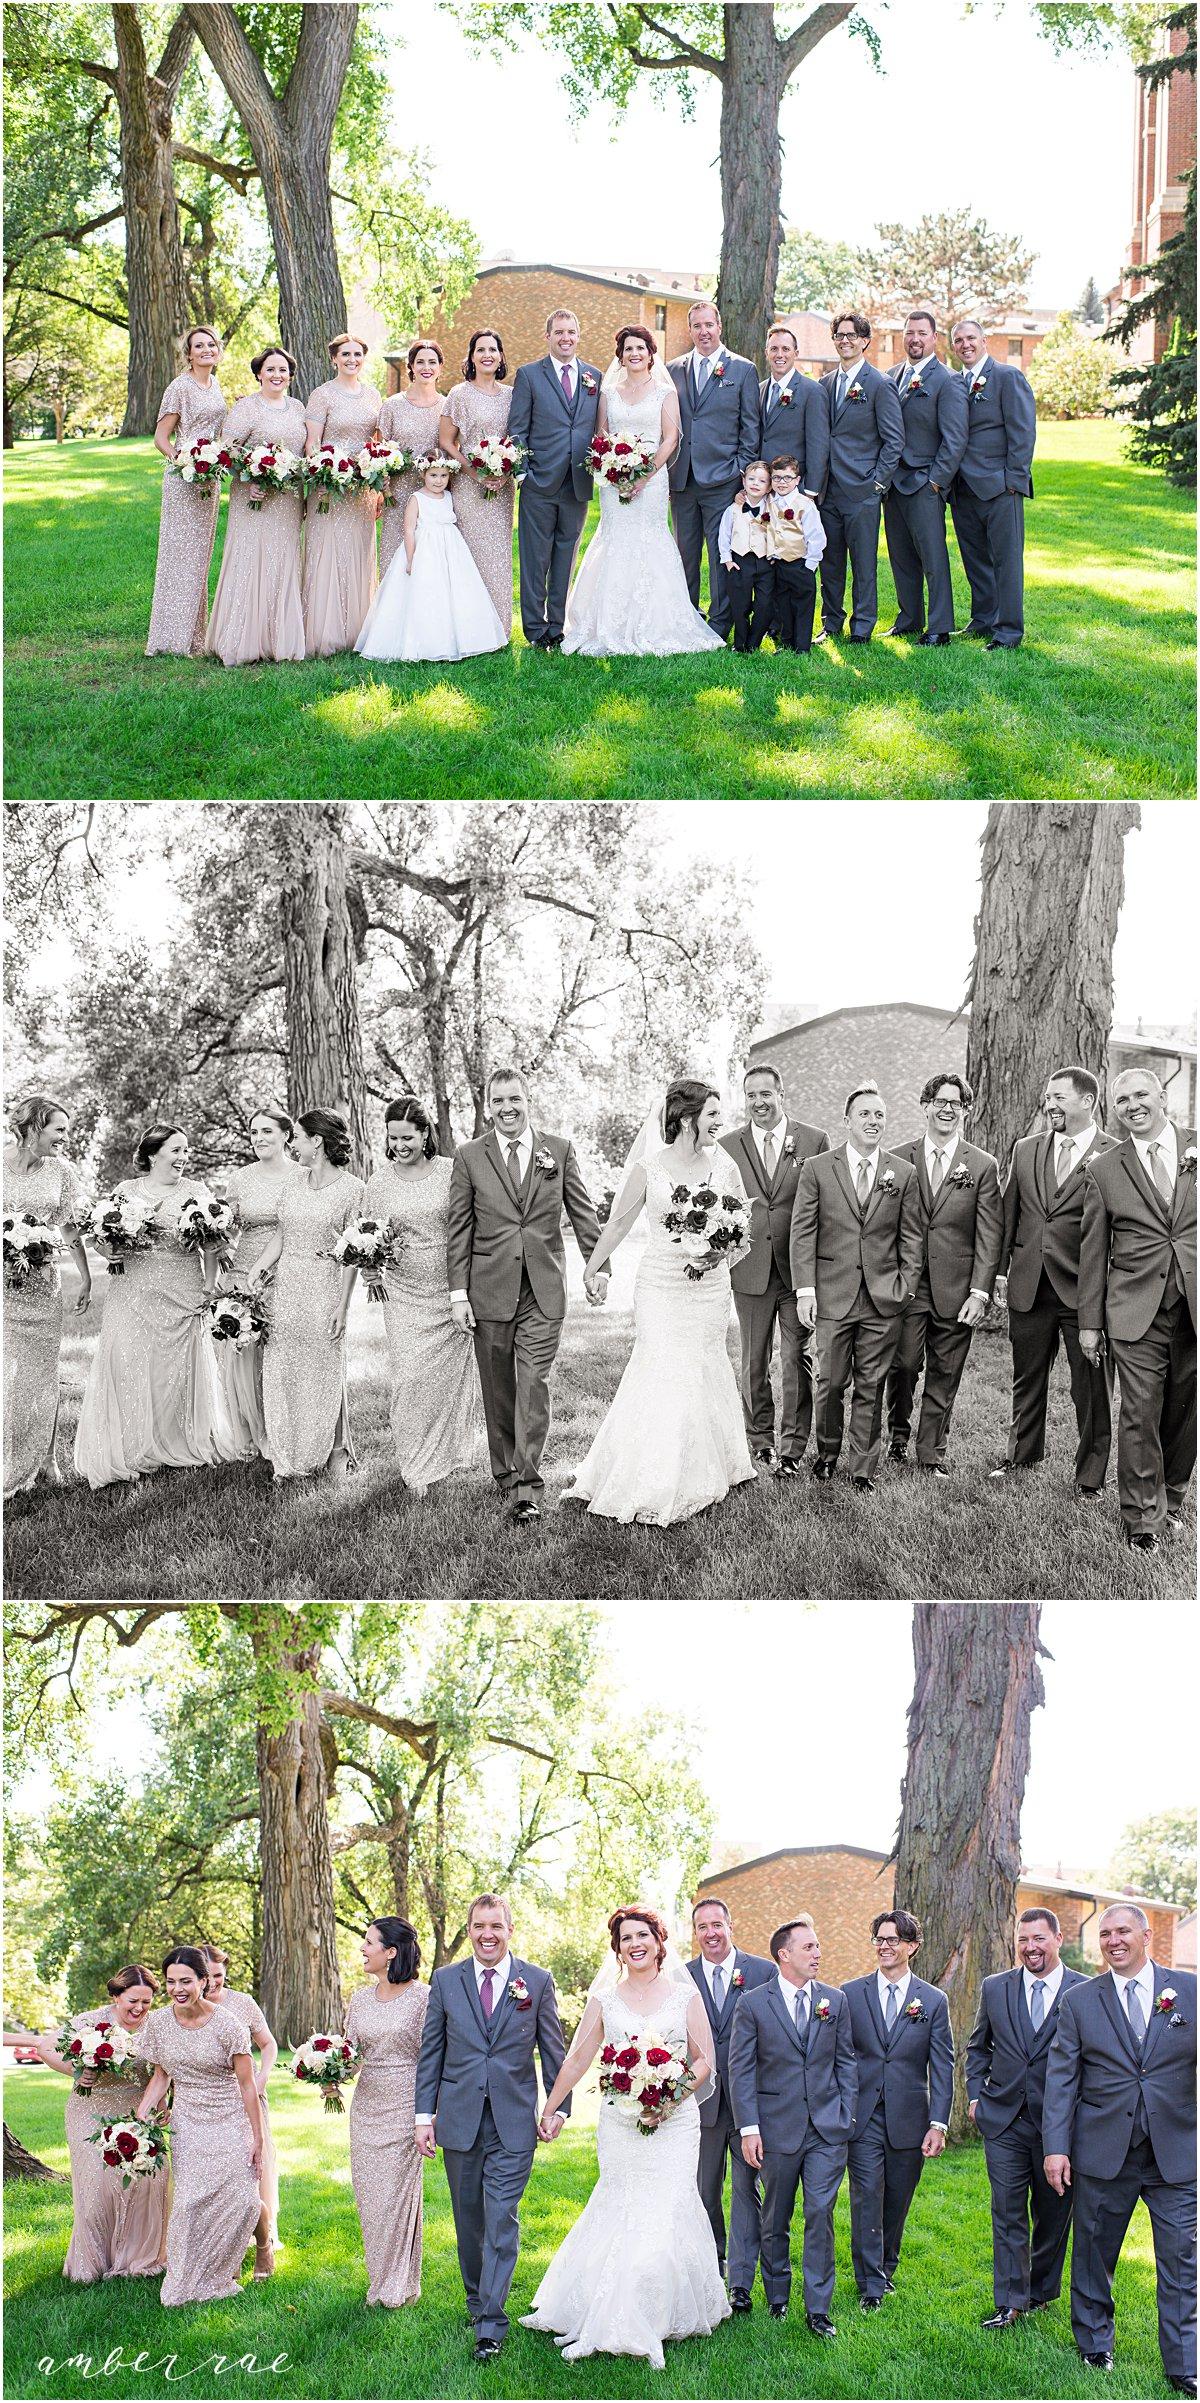 Gustafson Wedding 2018_0010.jpg